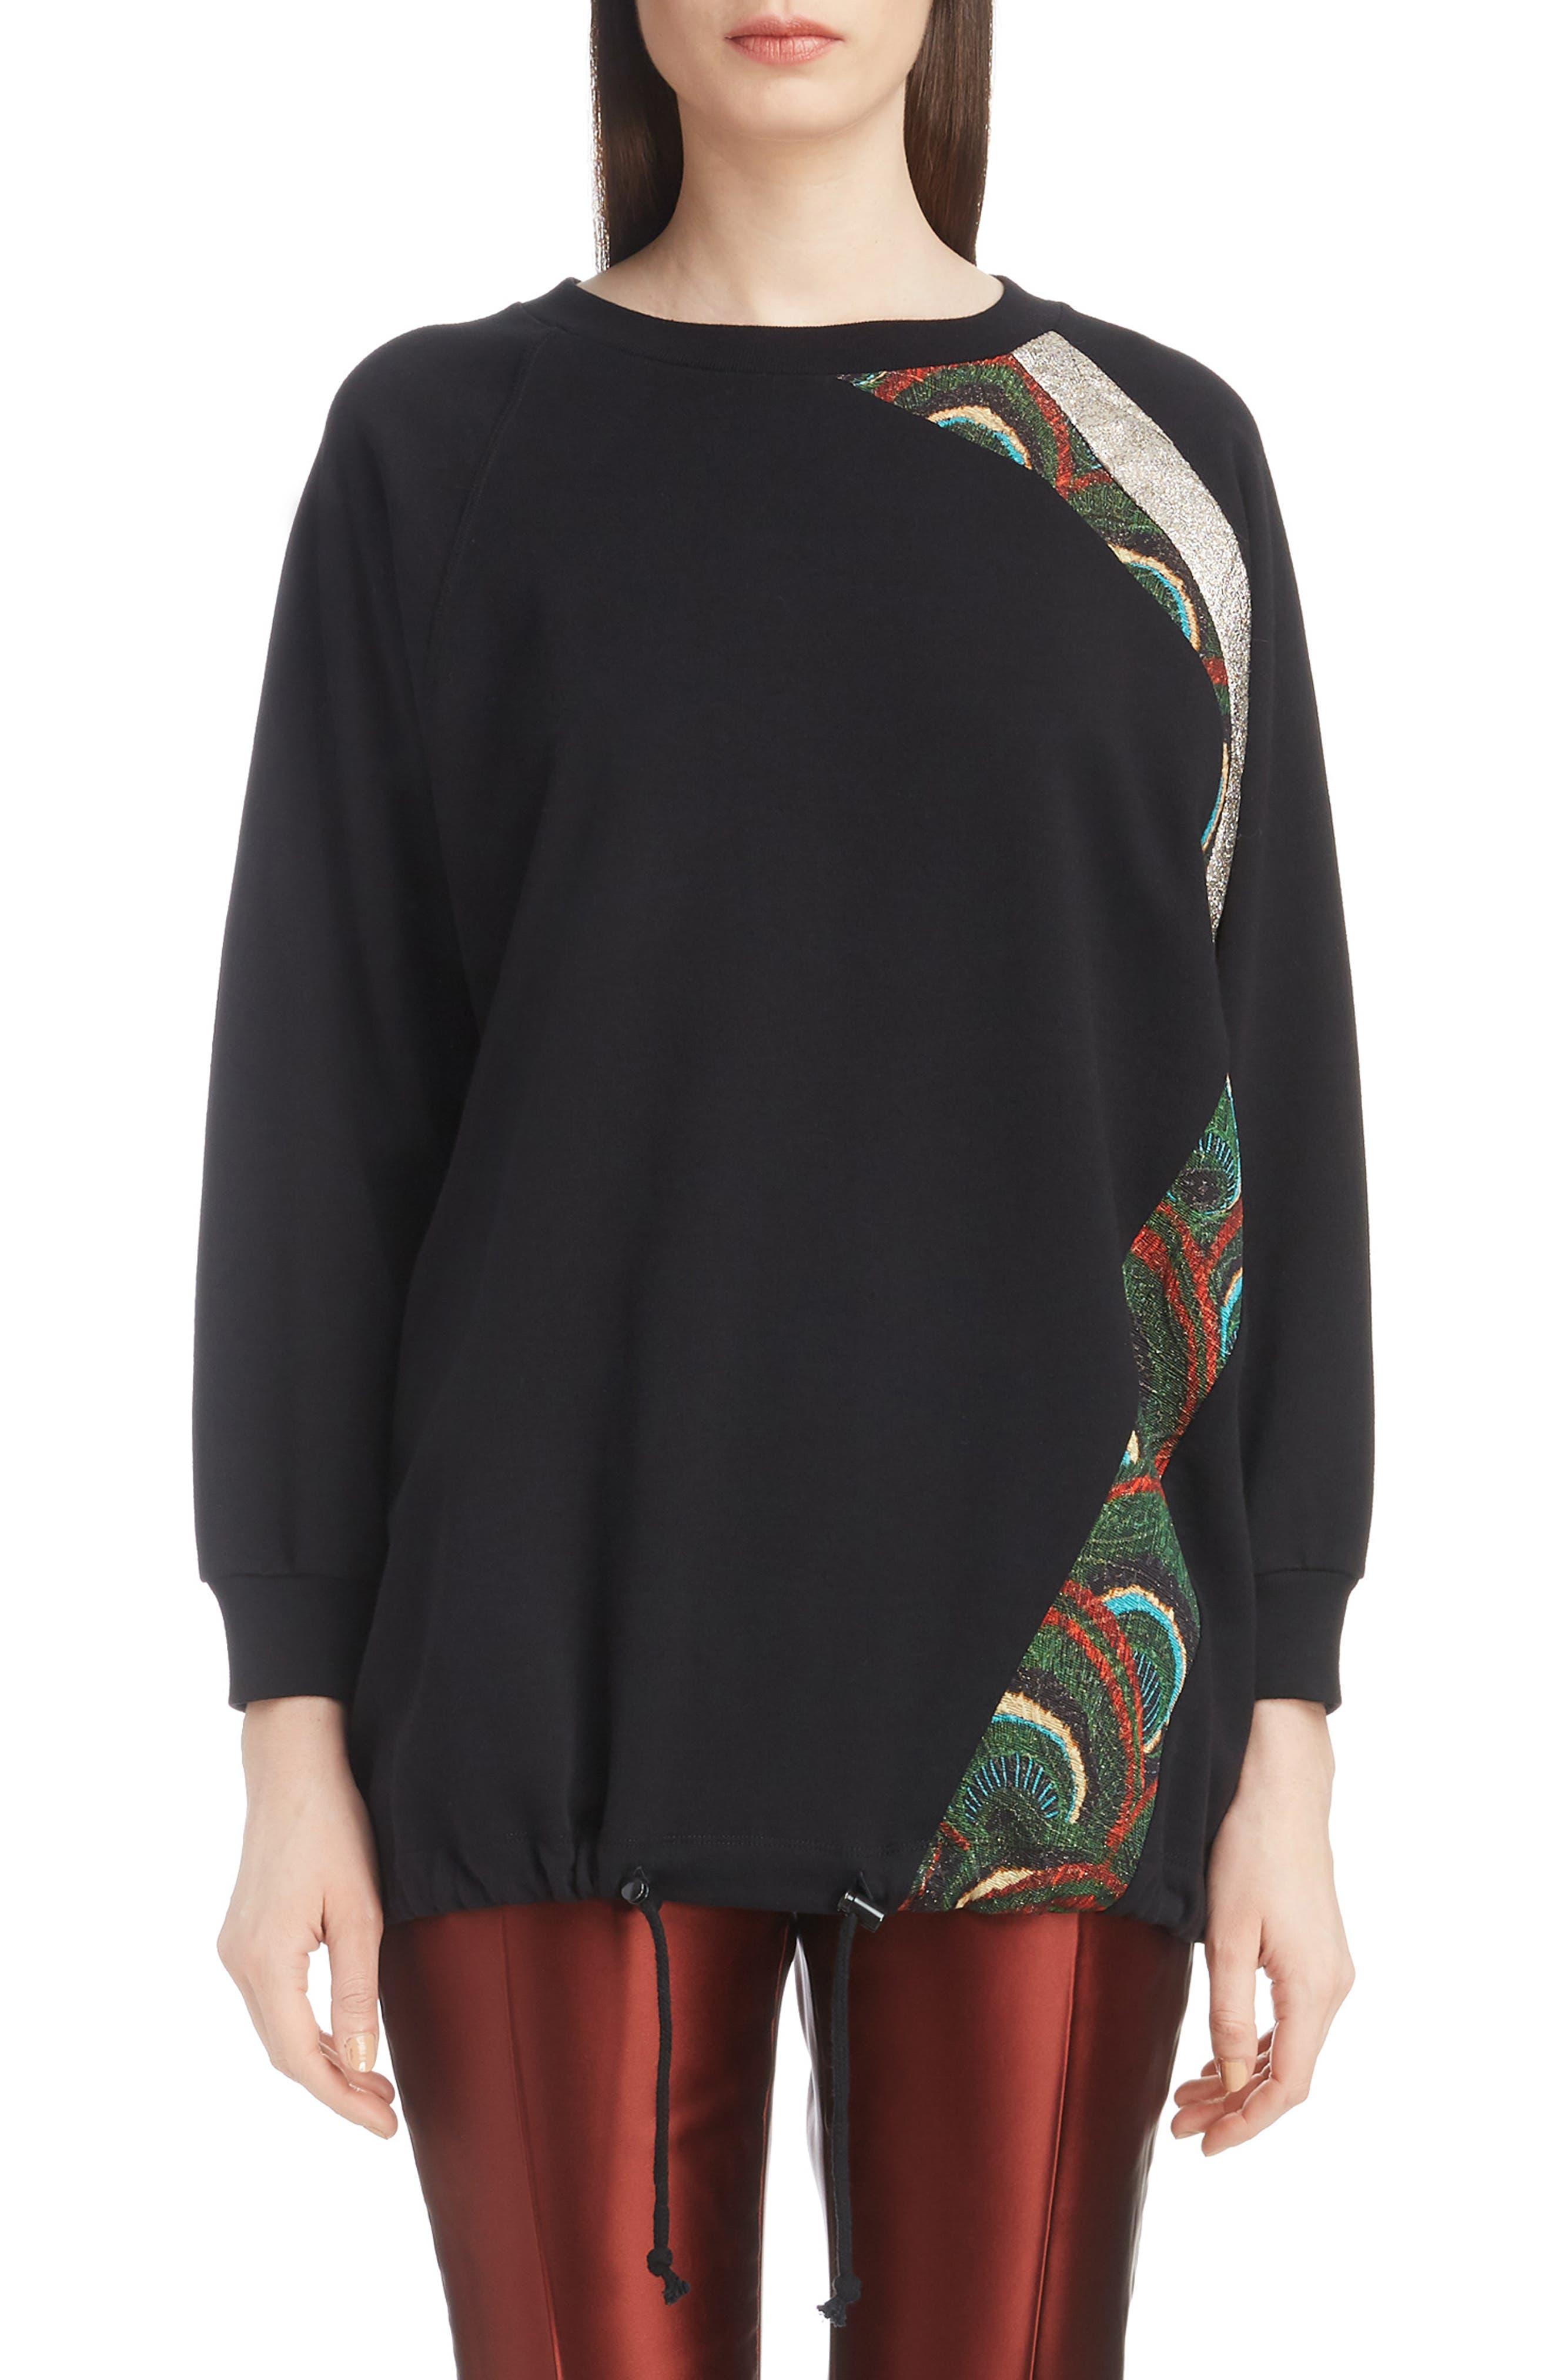 Metallic & Peacock Inset Sweatshirt,                         Main,                         color, BLACK